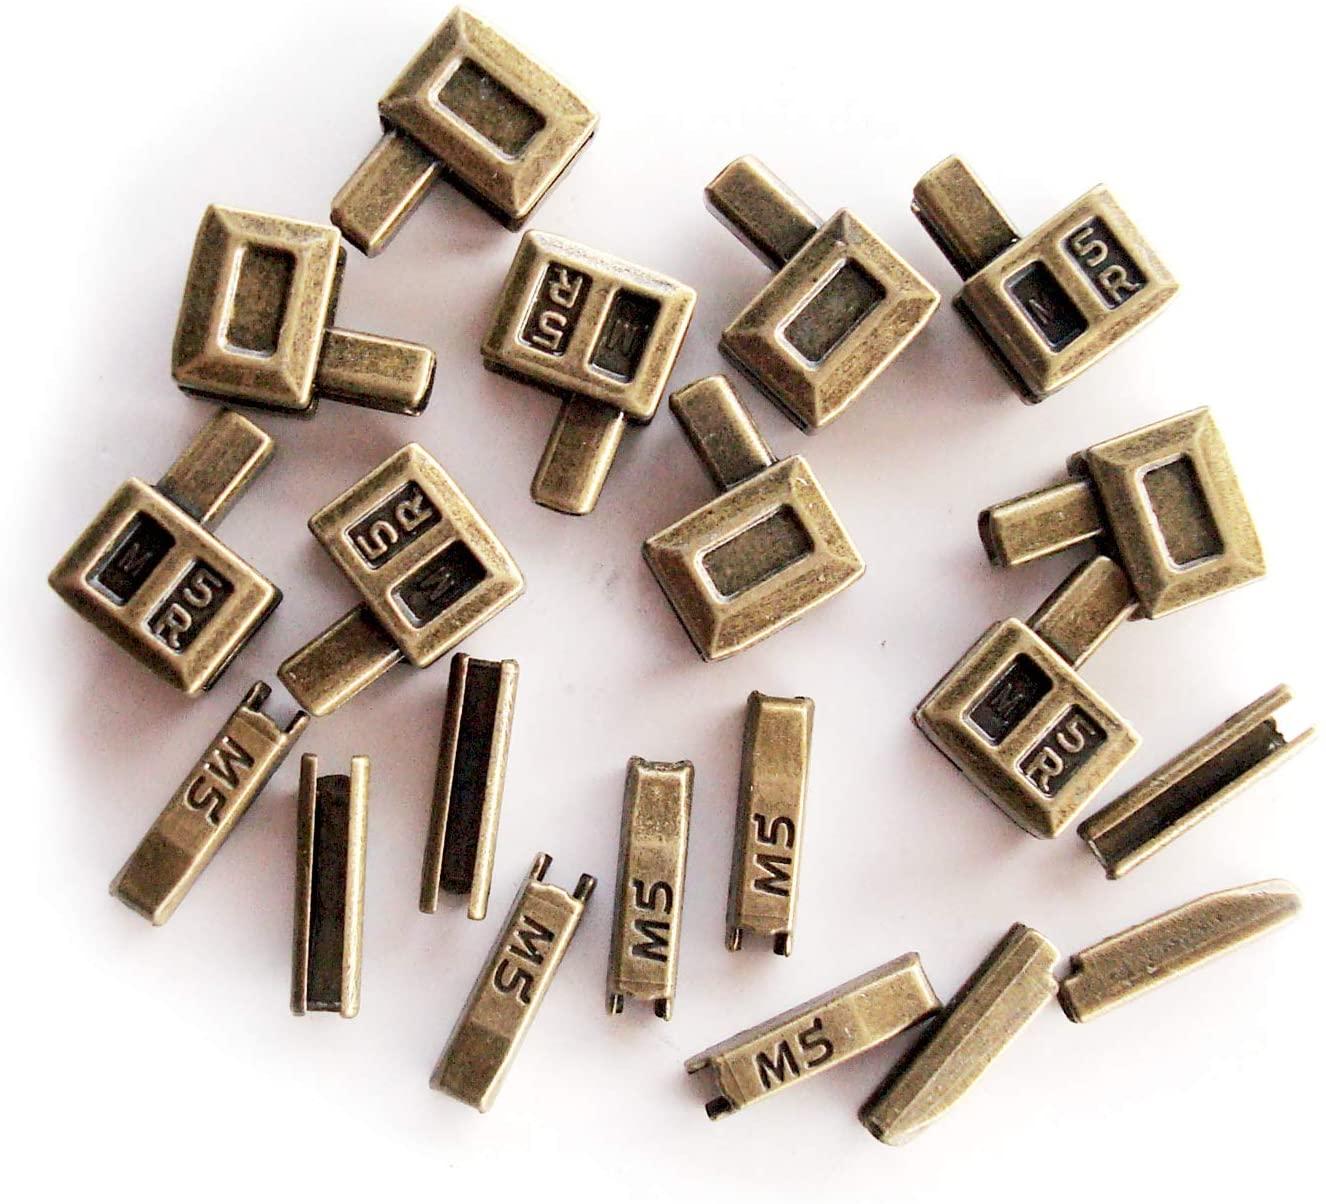 20 pcs #5 Metal Zipper Retainer Box and Zipper Insertion pin,Bottom Sliders Zipper Insertion pin Repair kit Replacement (Bronze)